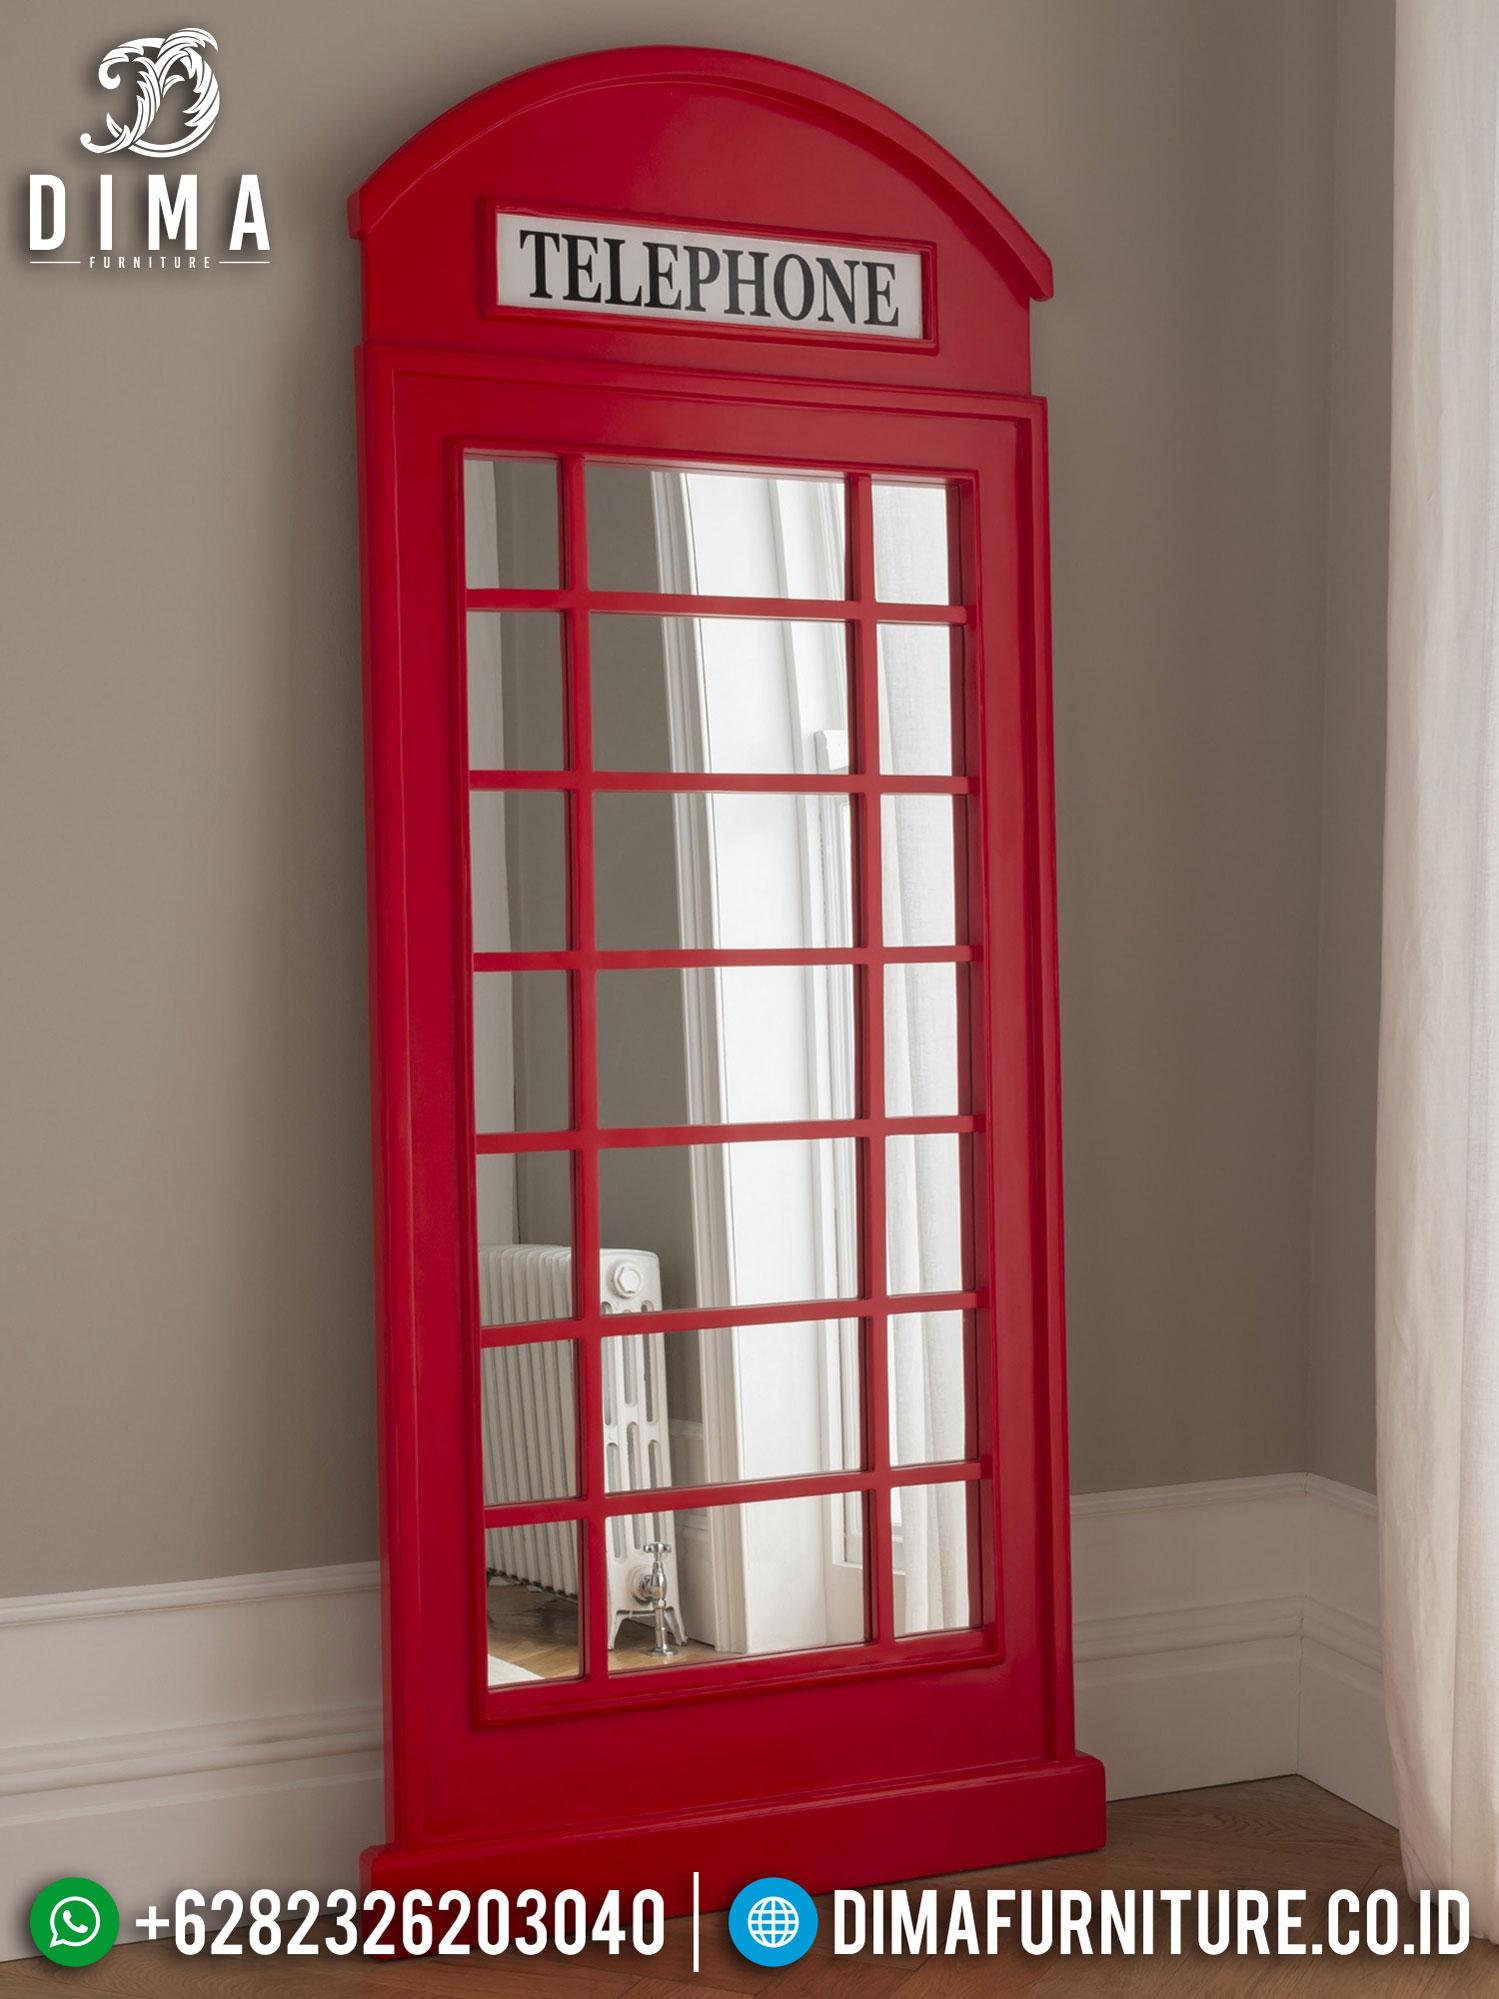 Model Stand Cermin Hias Minimalis Vintage Red Heart Color Classic Design TTJ-1290